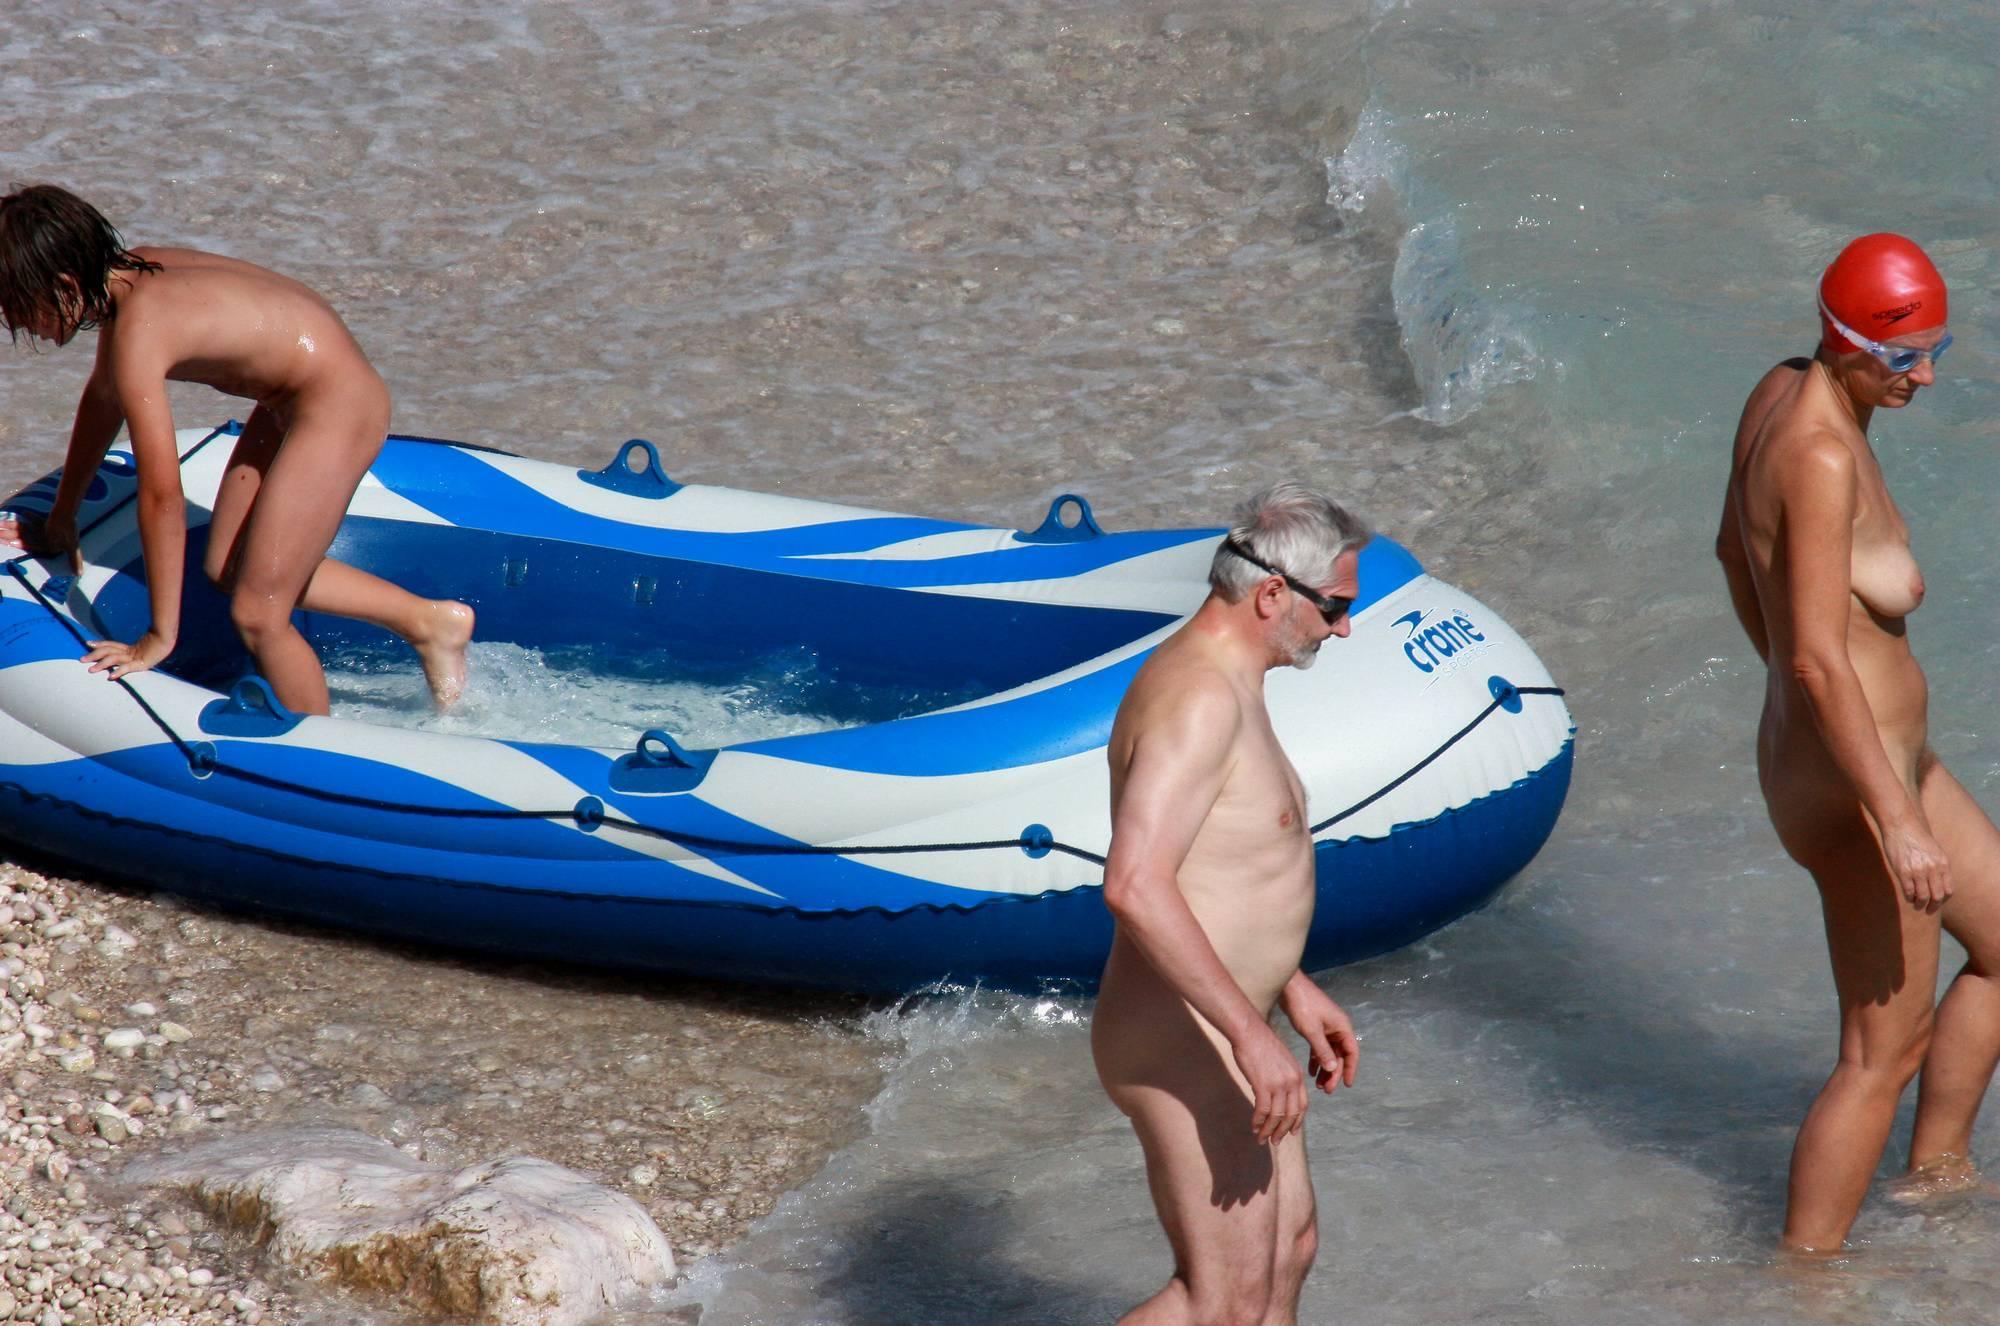 Nudist Gallery Naturist Blue Boat Waters - 2